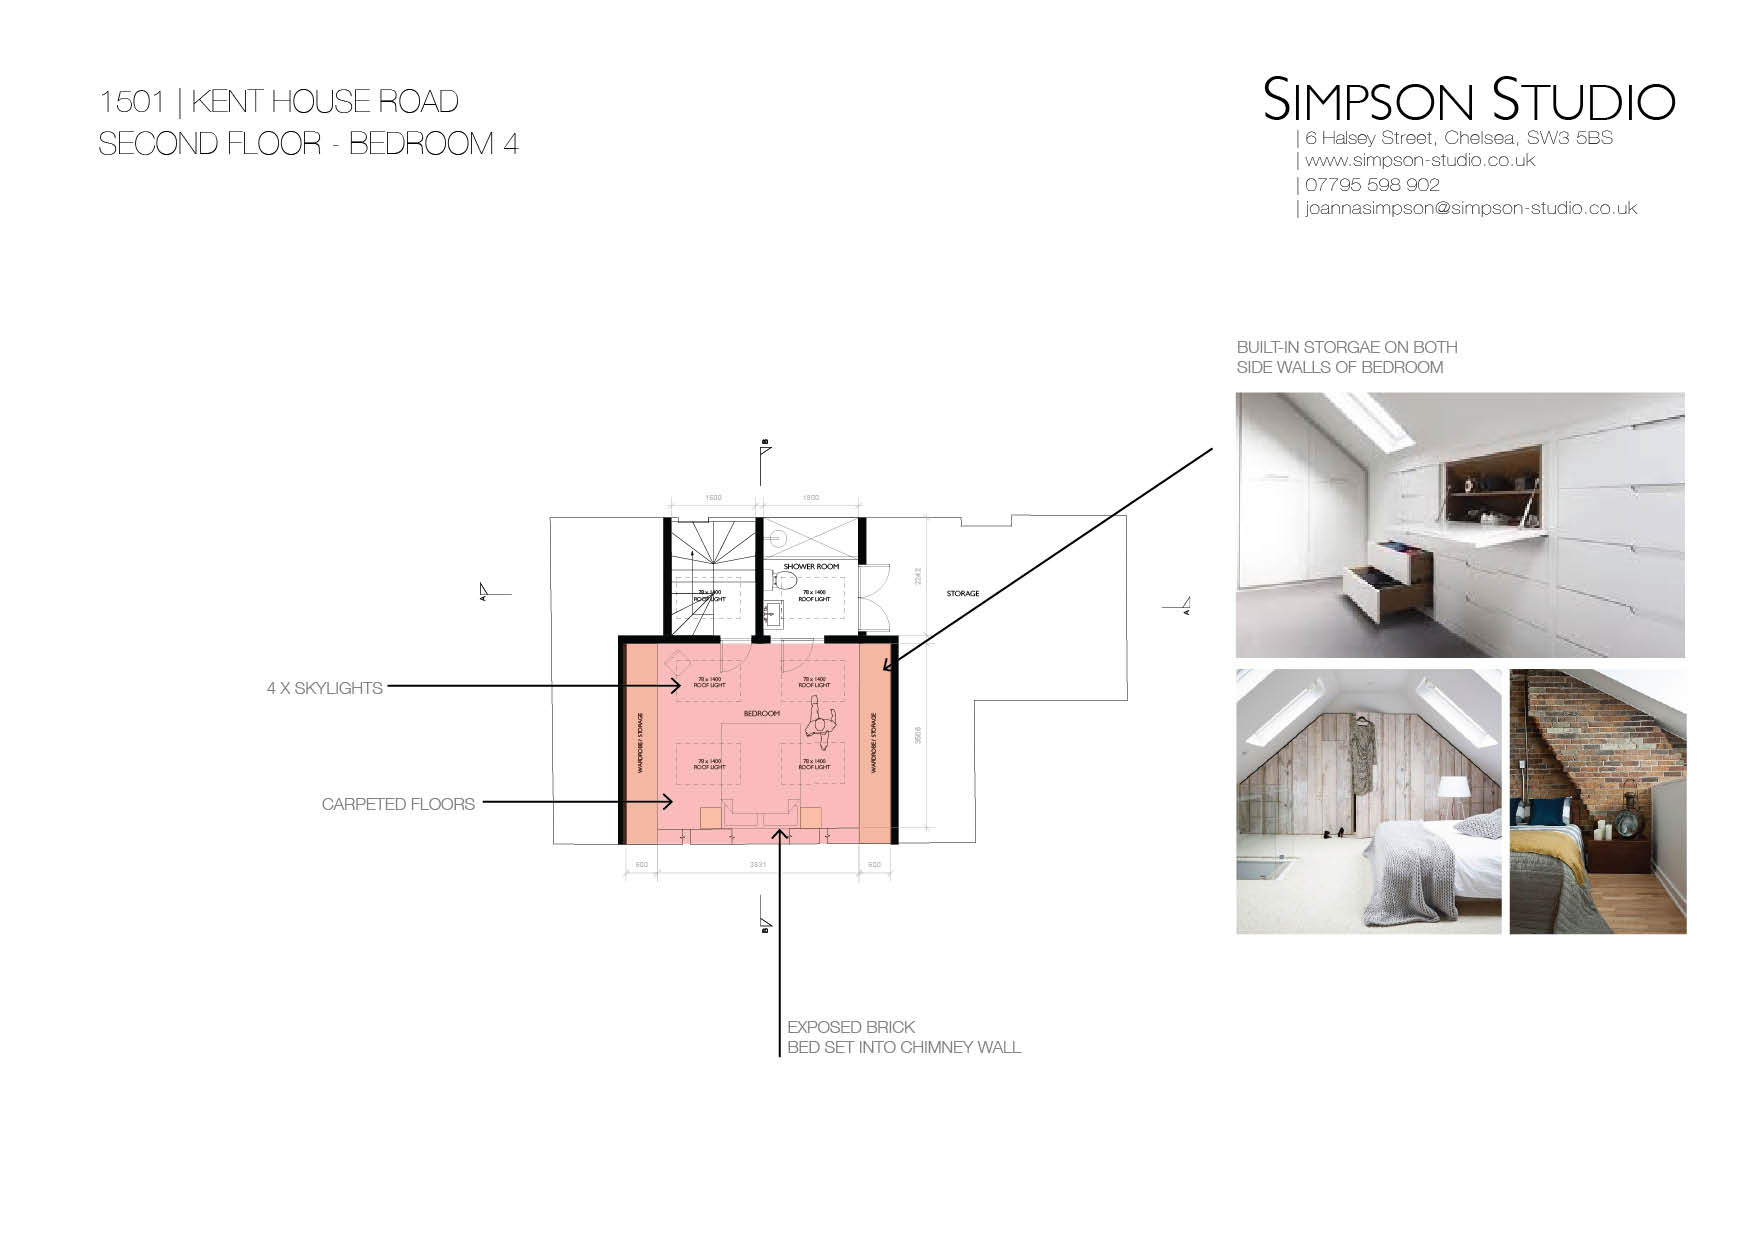 Kent House Road Room Planning28.jpg